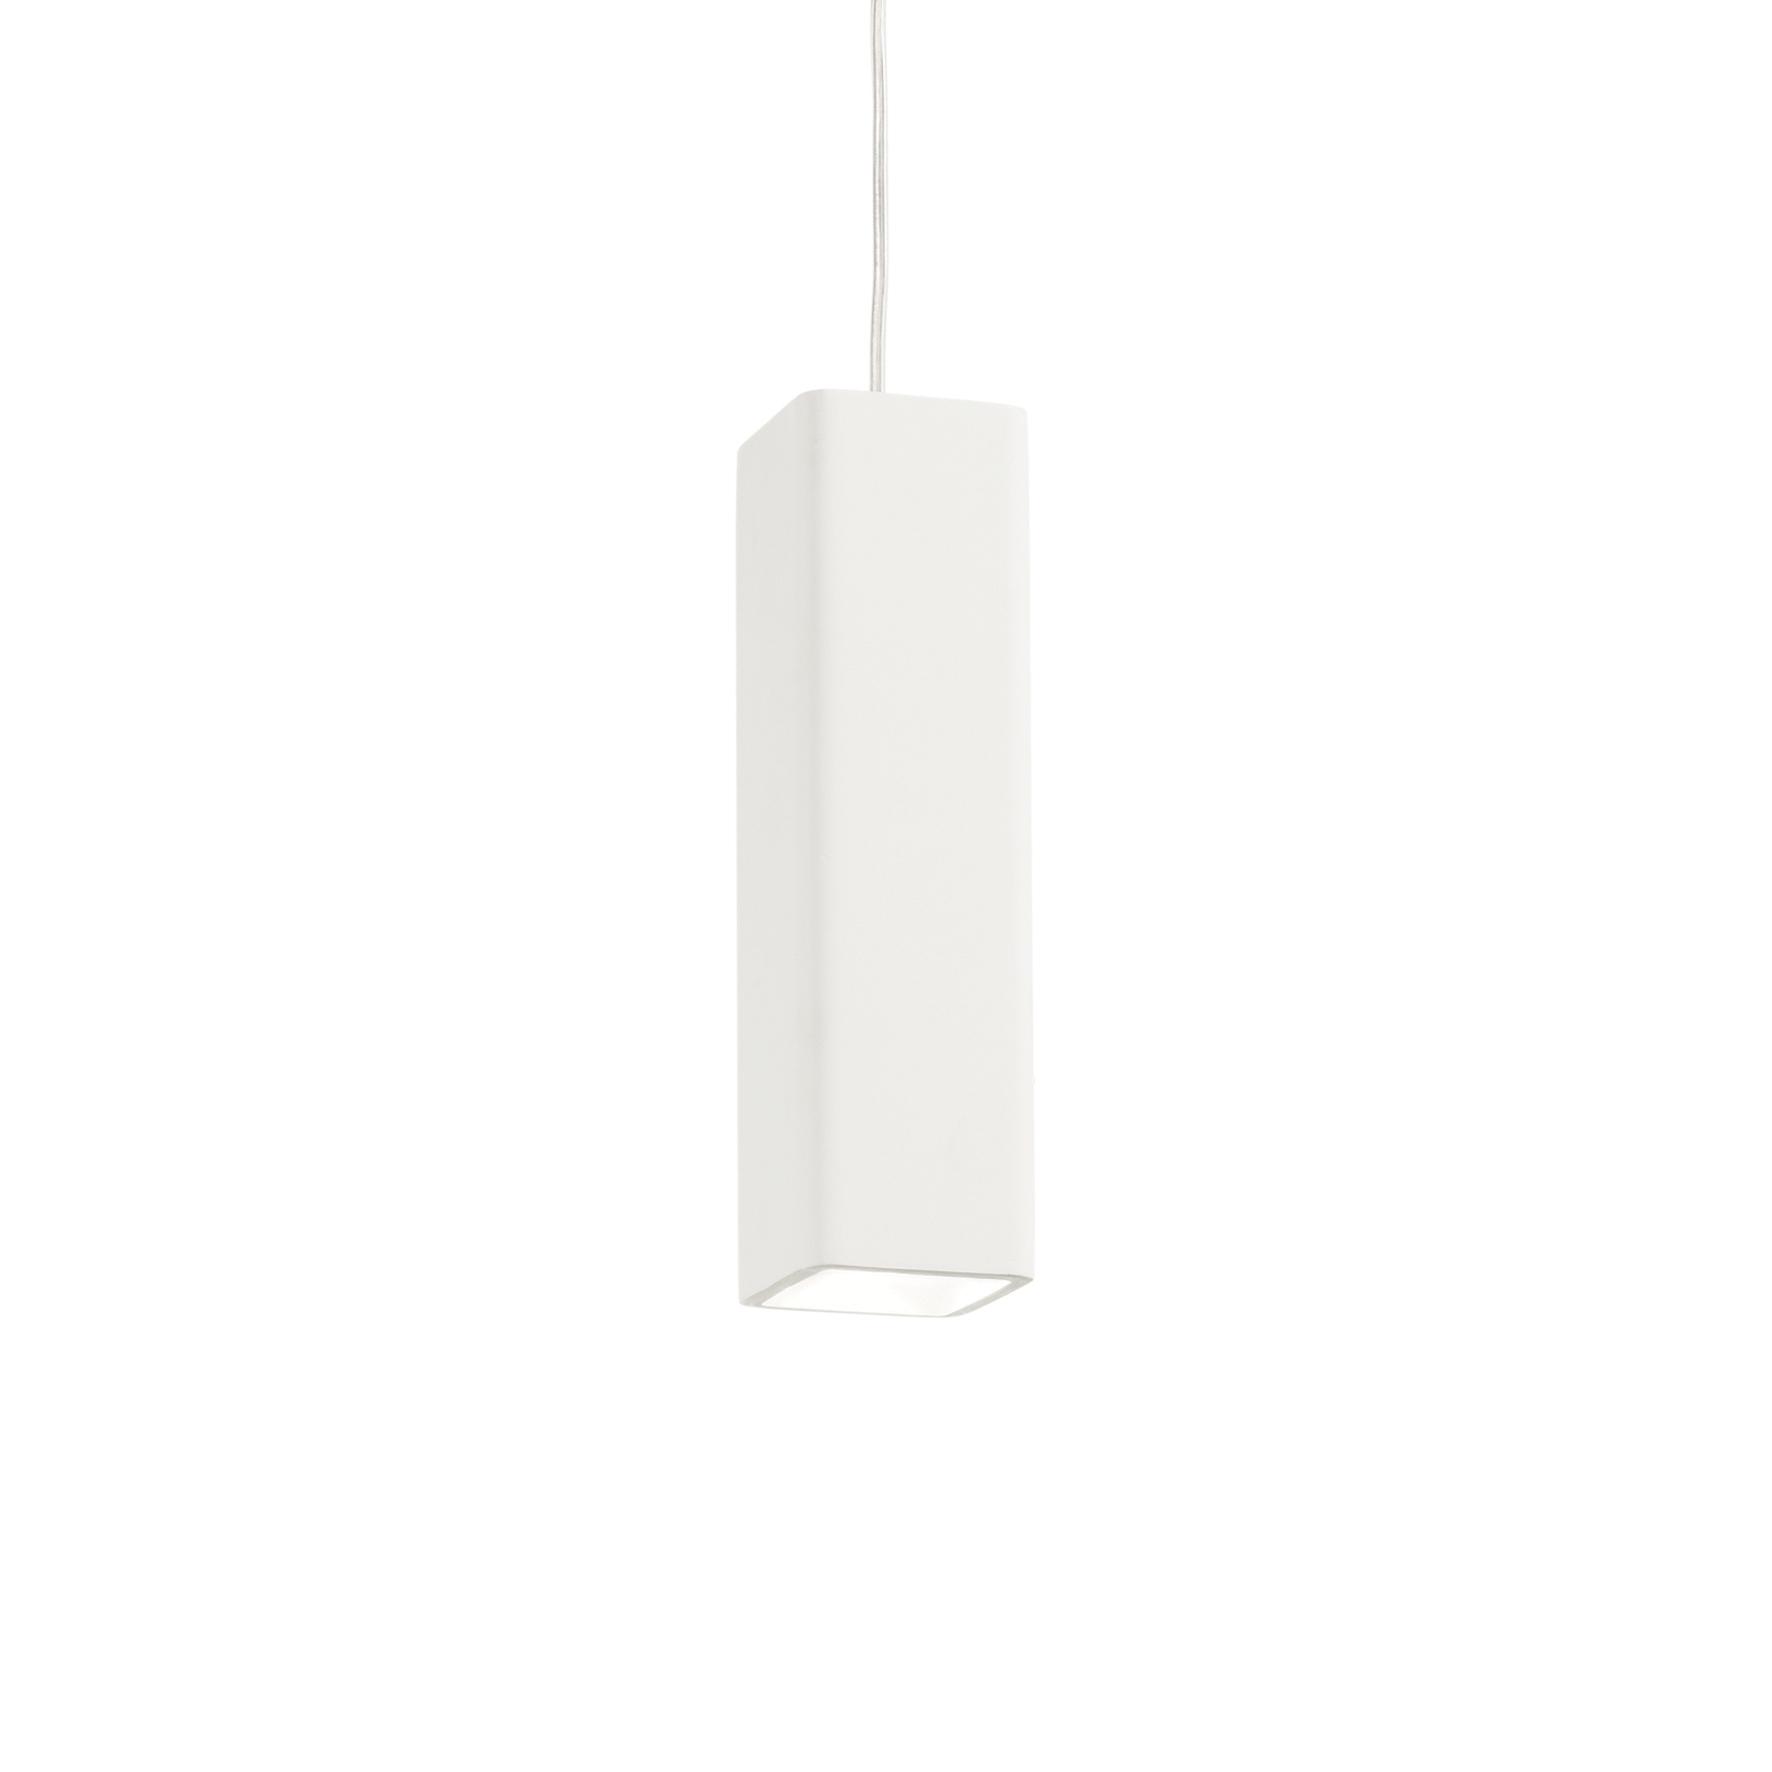 Lustra Oak SP1 Square White